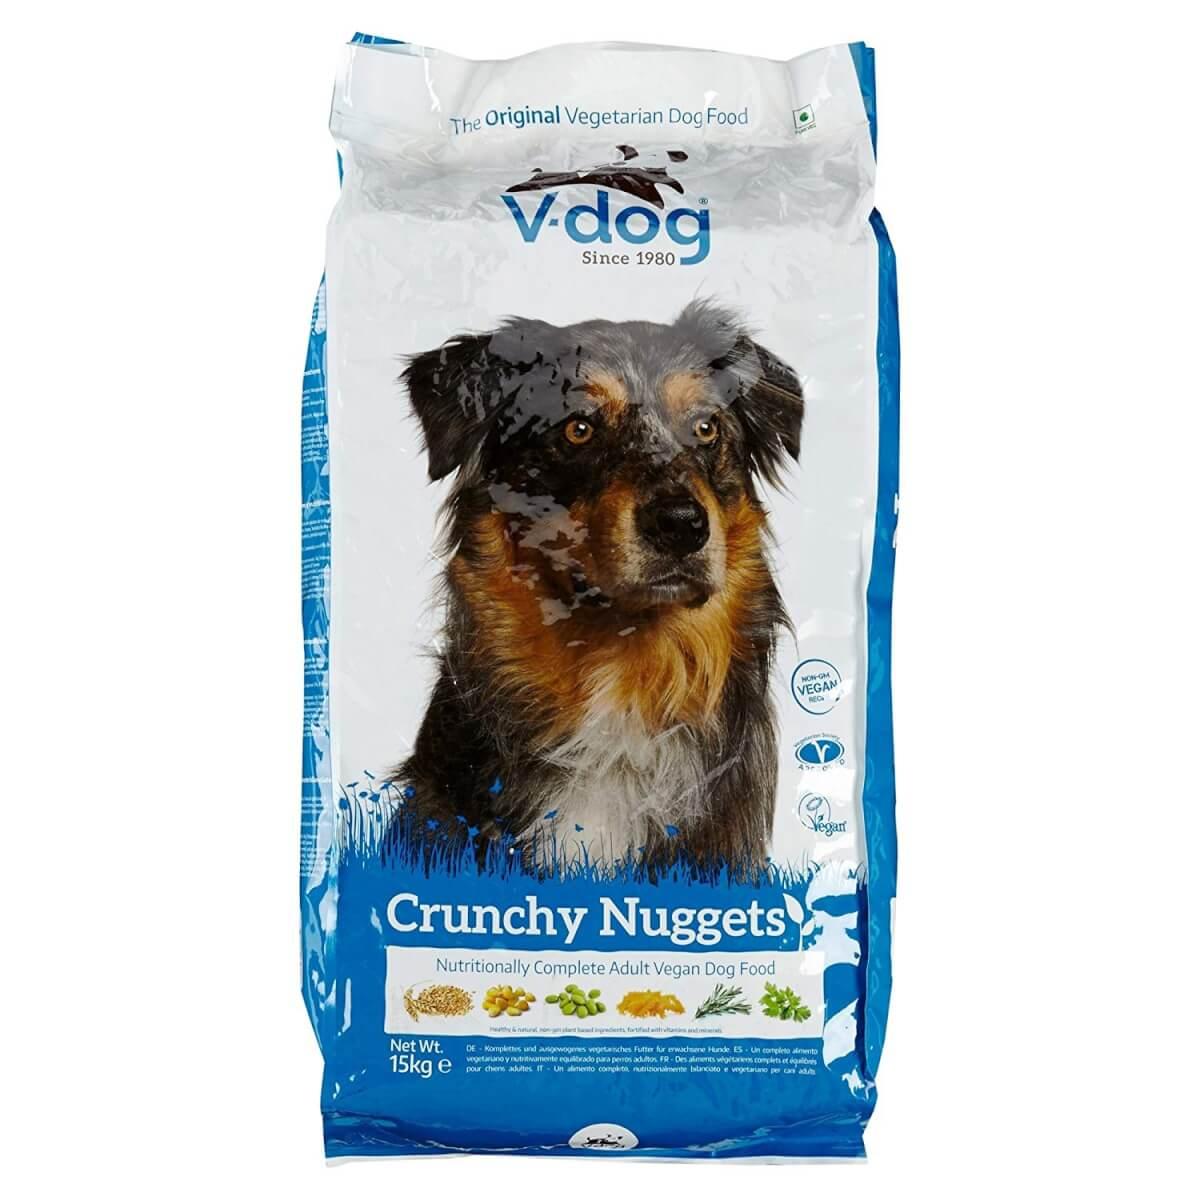 v-dog vegan nuggets